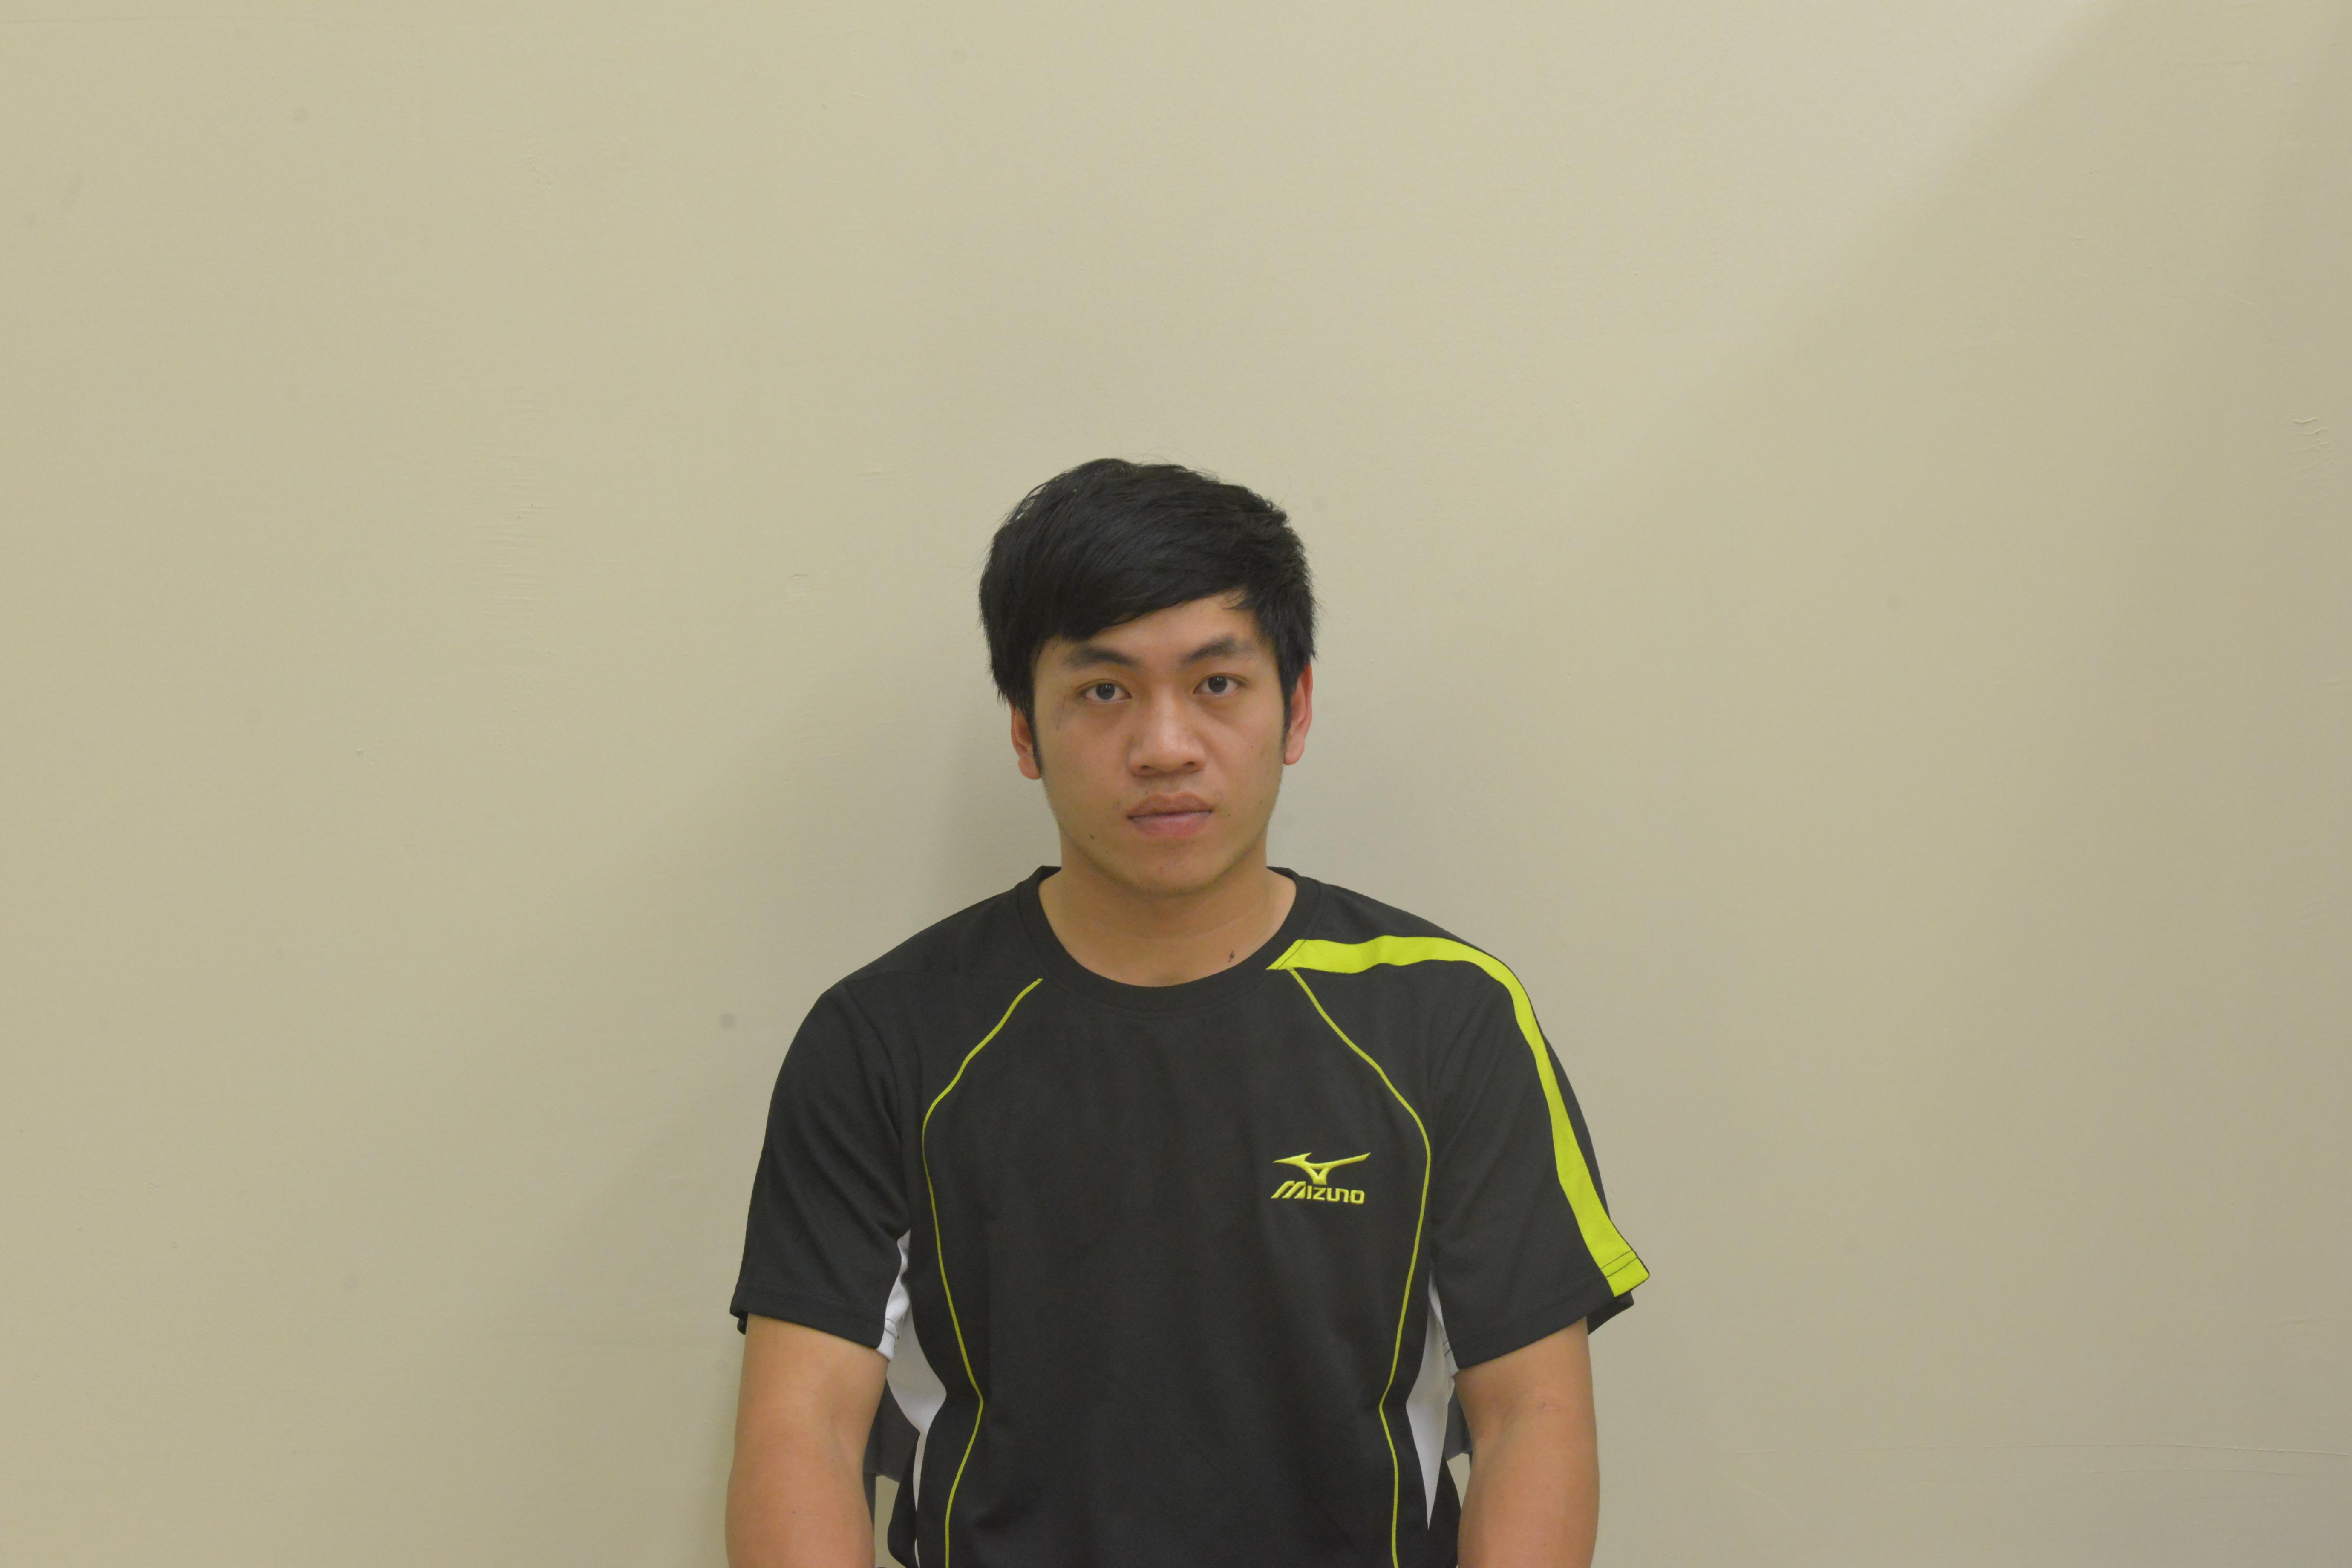 Yung-Shun Lin